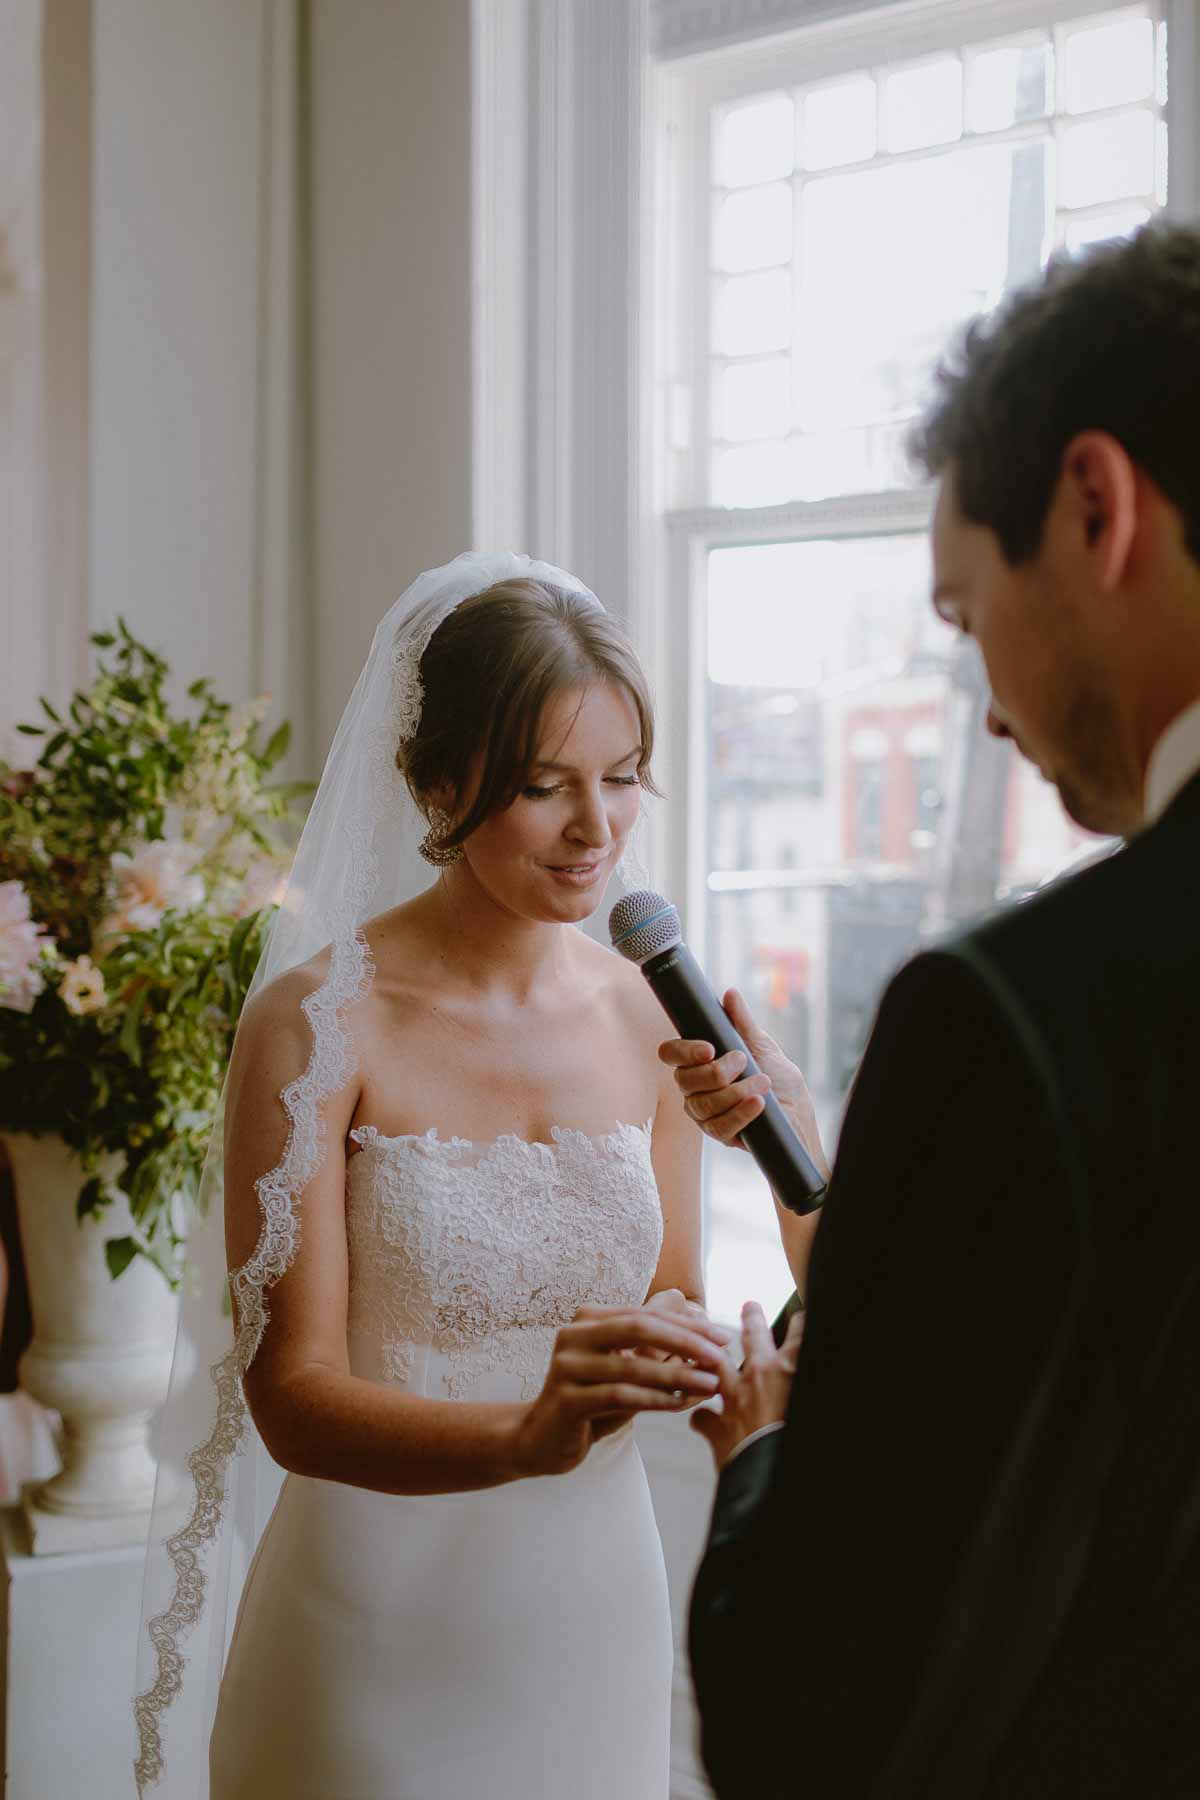 the-great-hall-wedding 0051.jpg